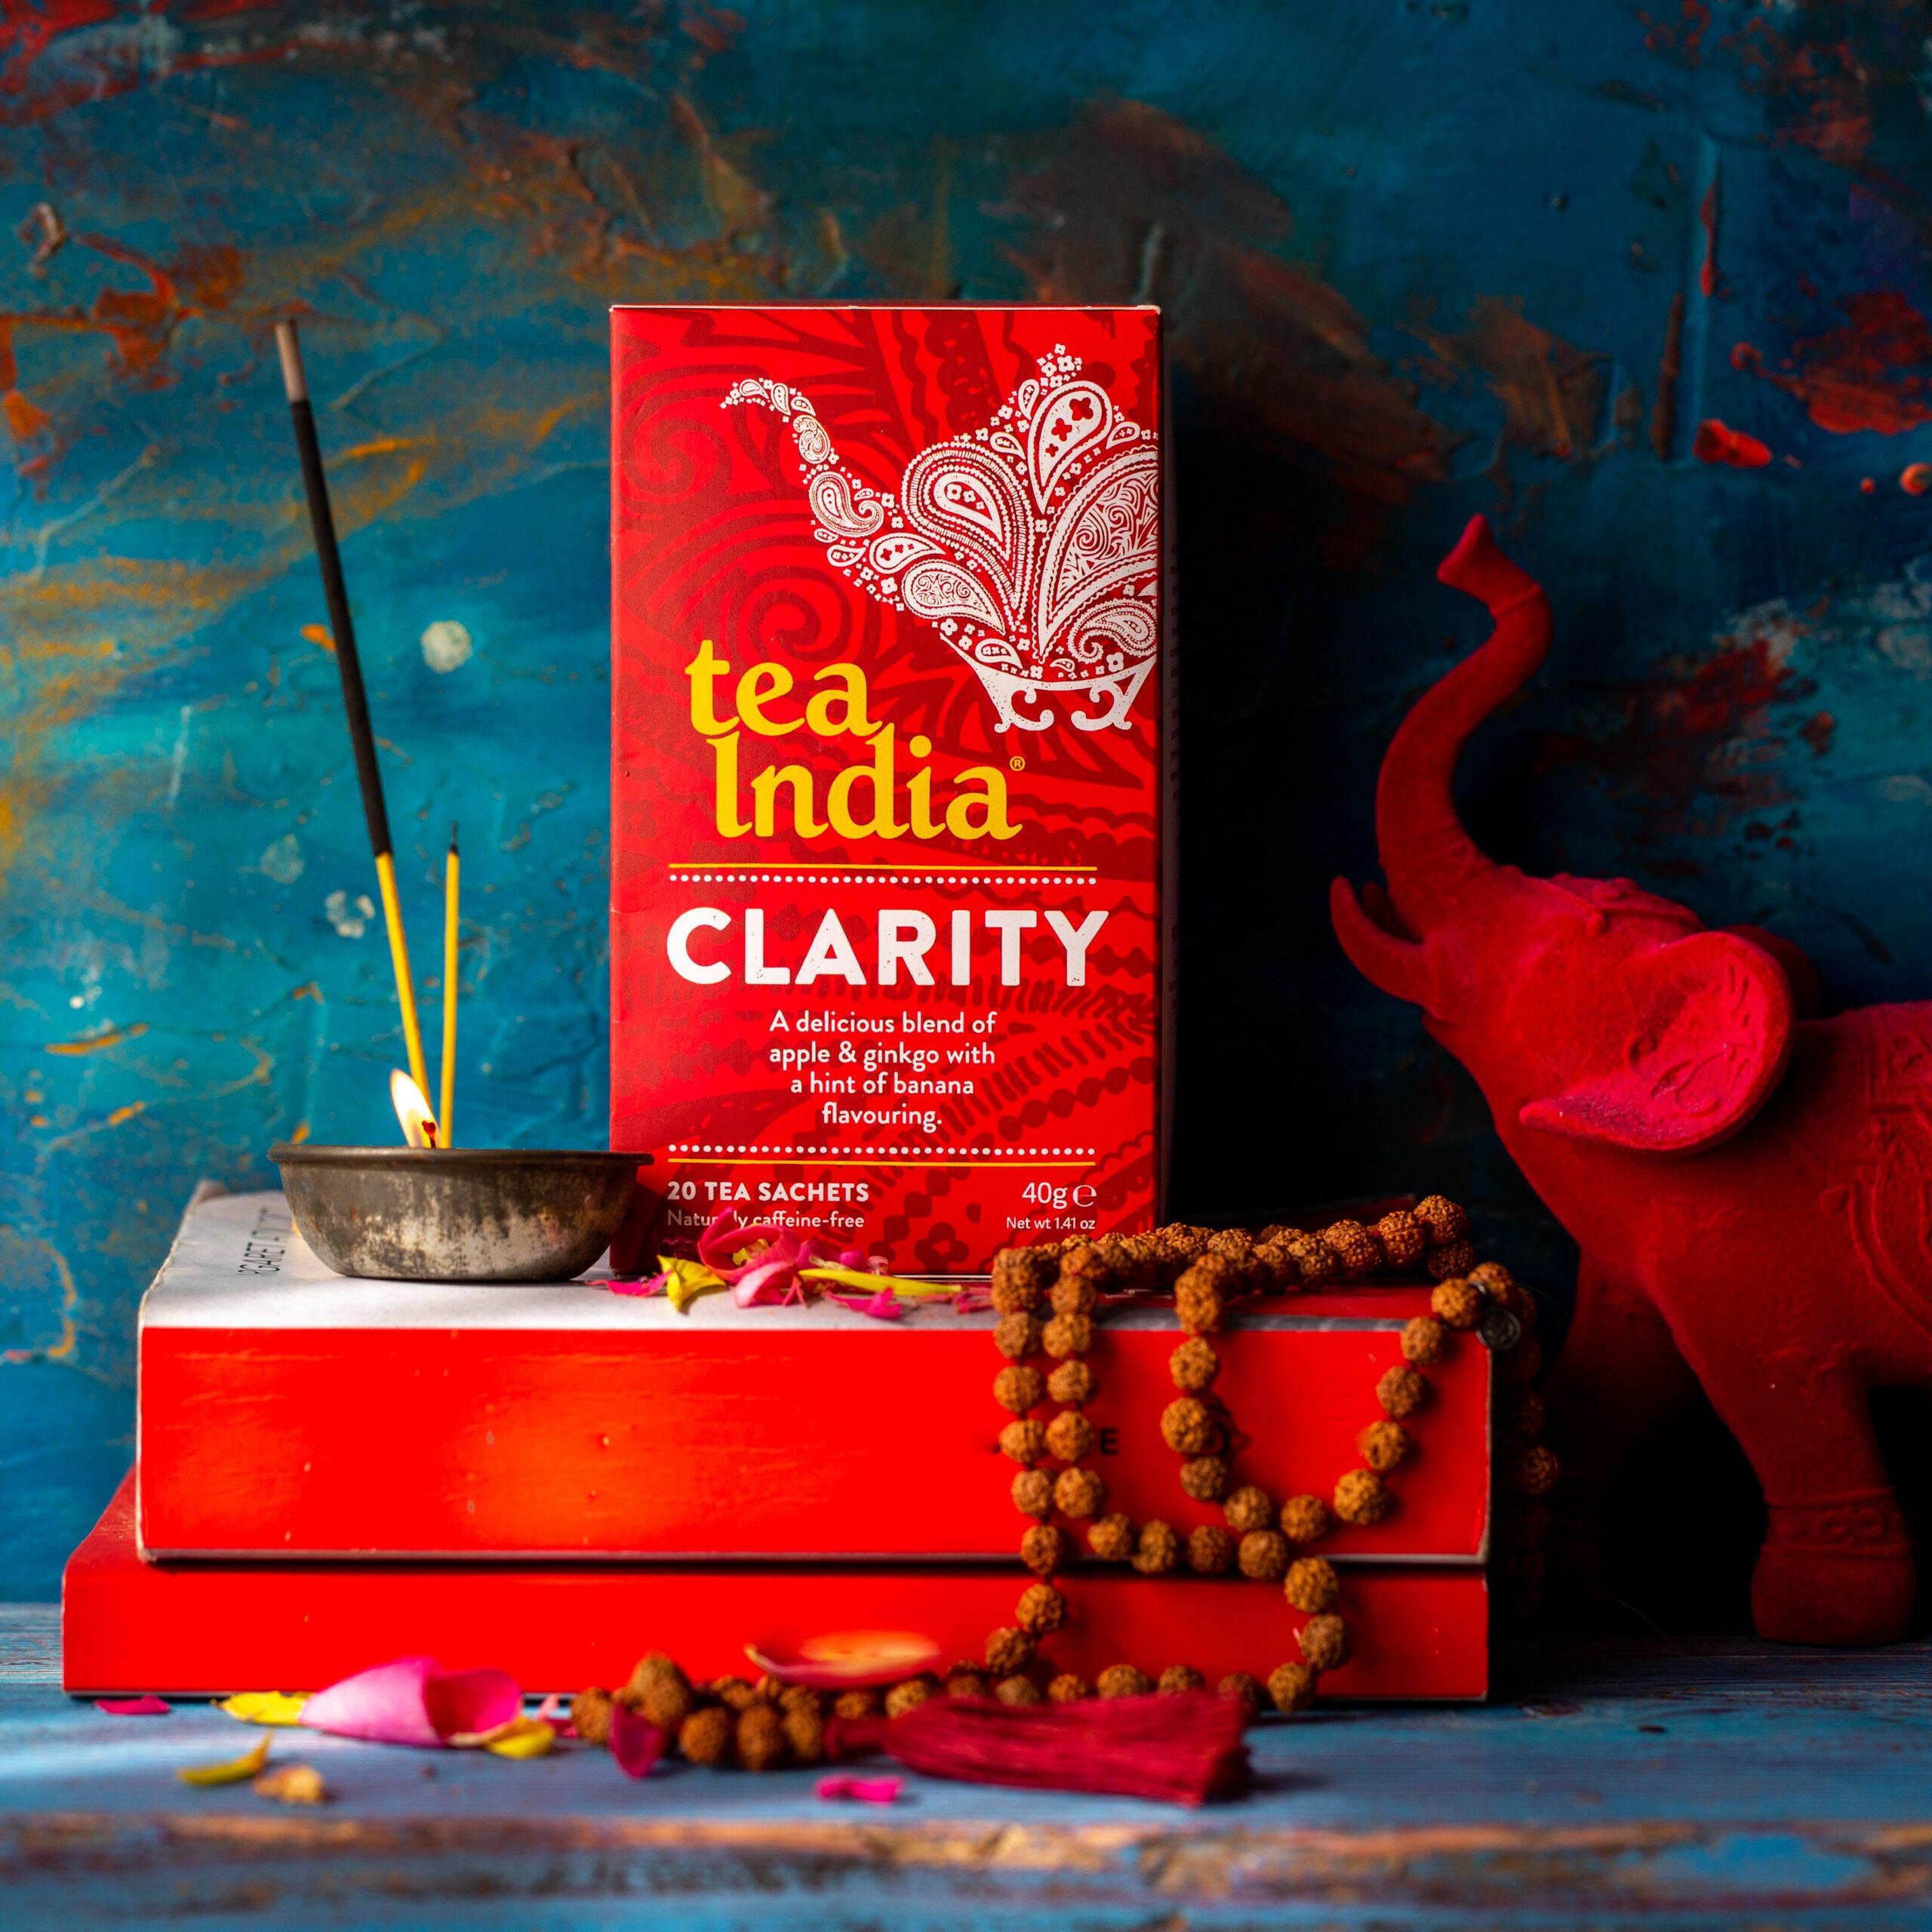 Tea India Herbal Tea for Clarity